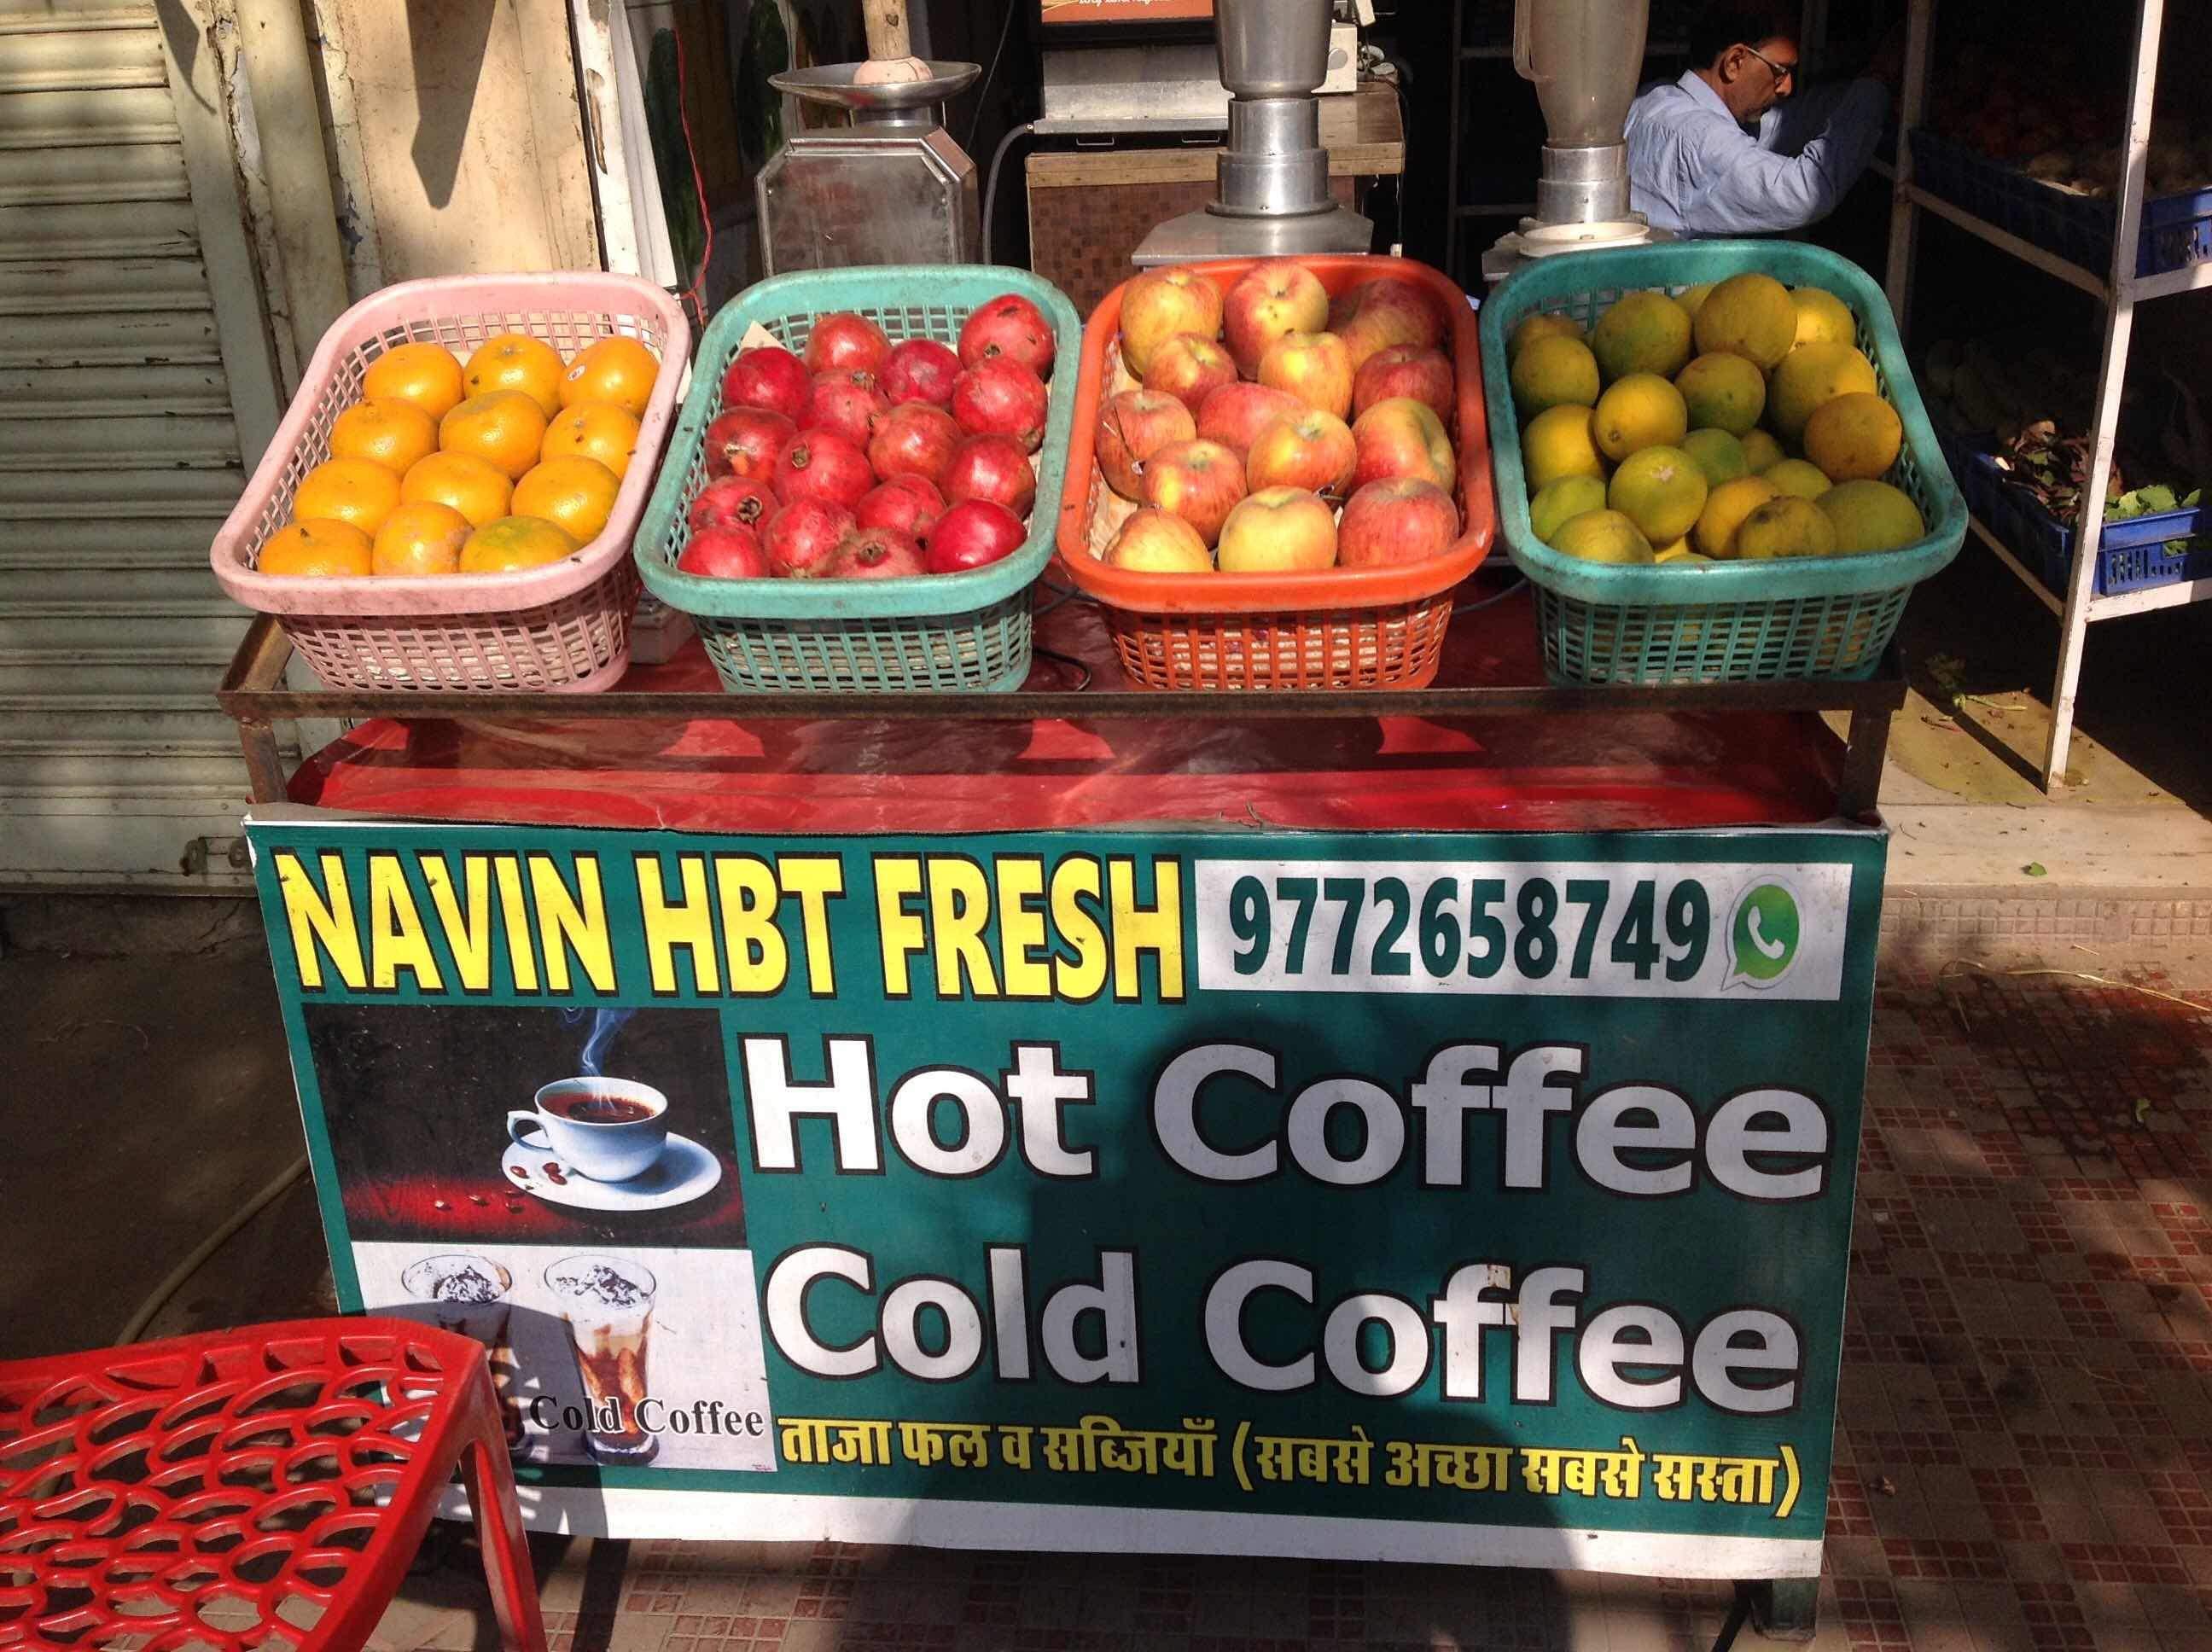 HBT Fresh Mansarovar Ve able Home Delivery Services in Jaipur Justdial